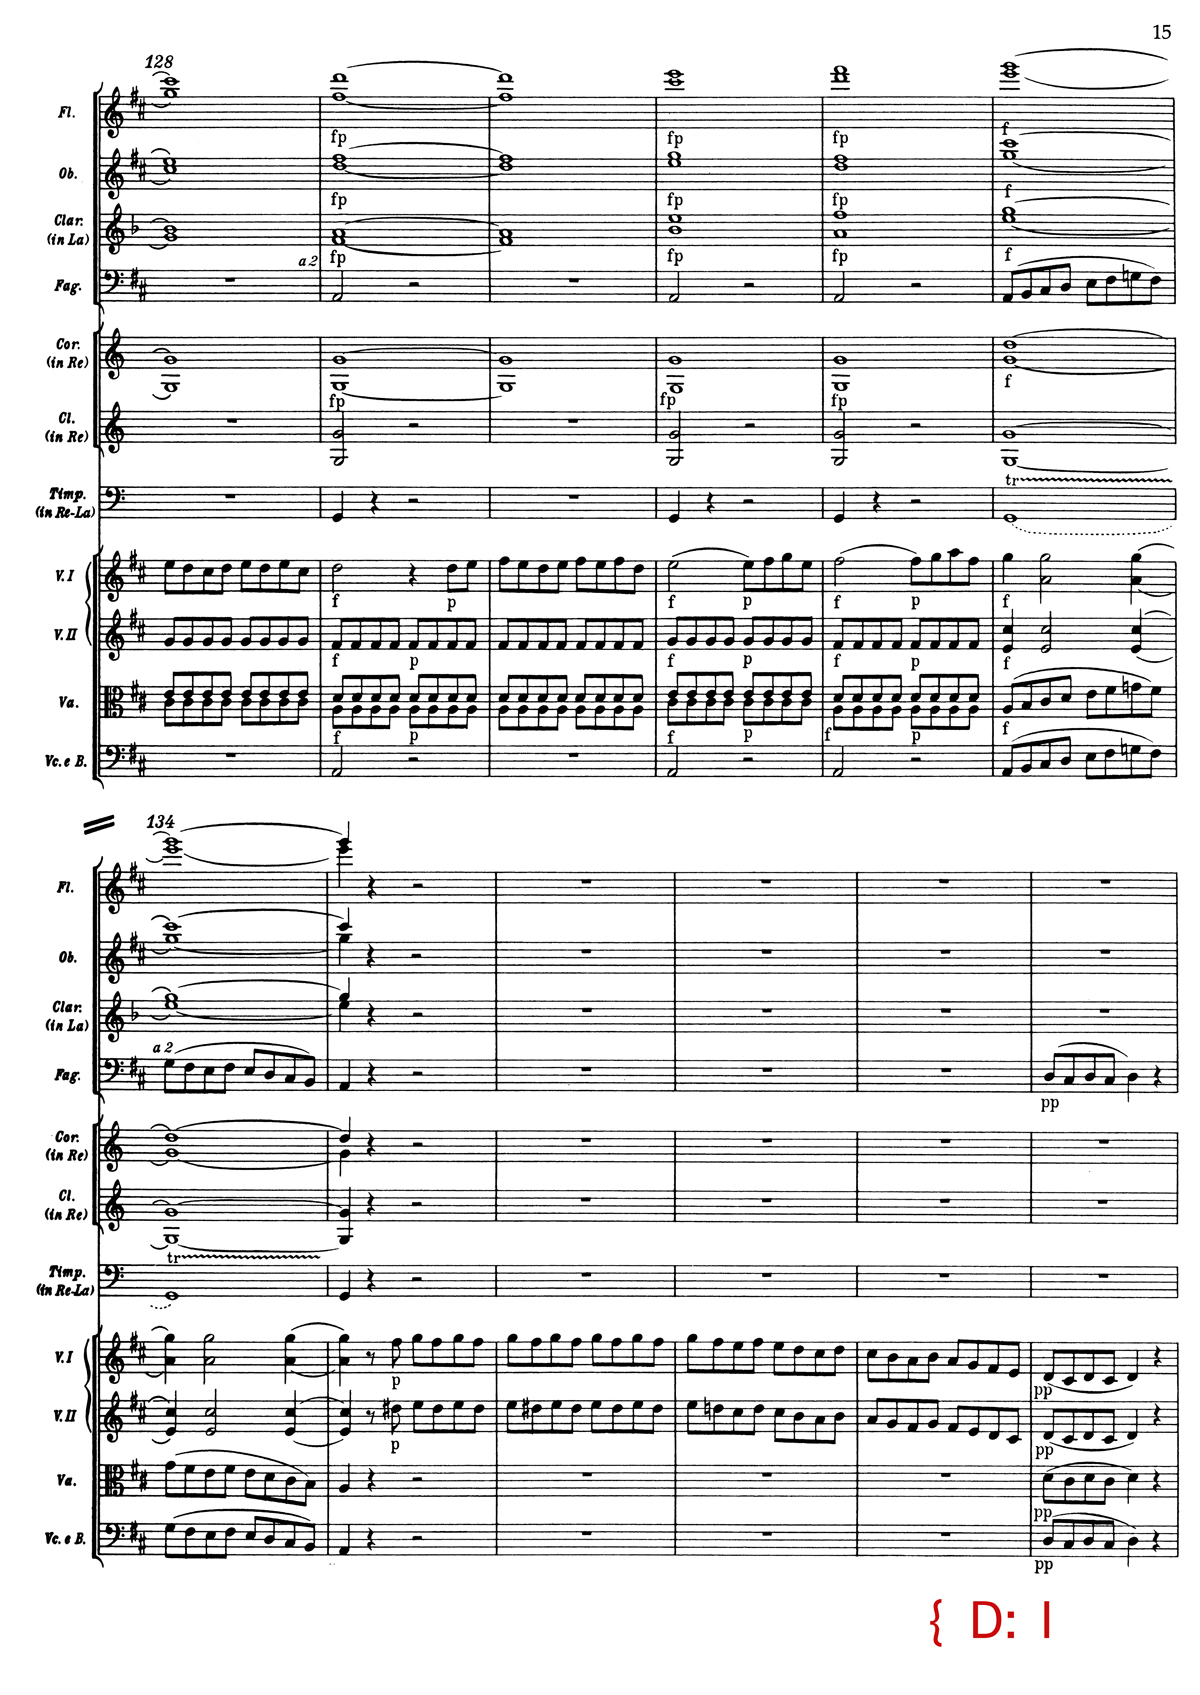 Mozart_Figaro_Theory_4.jpg